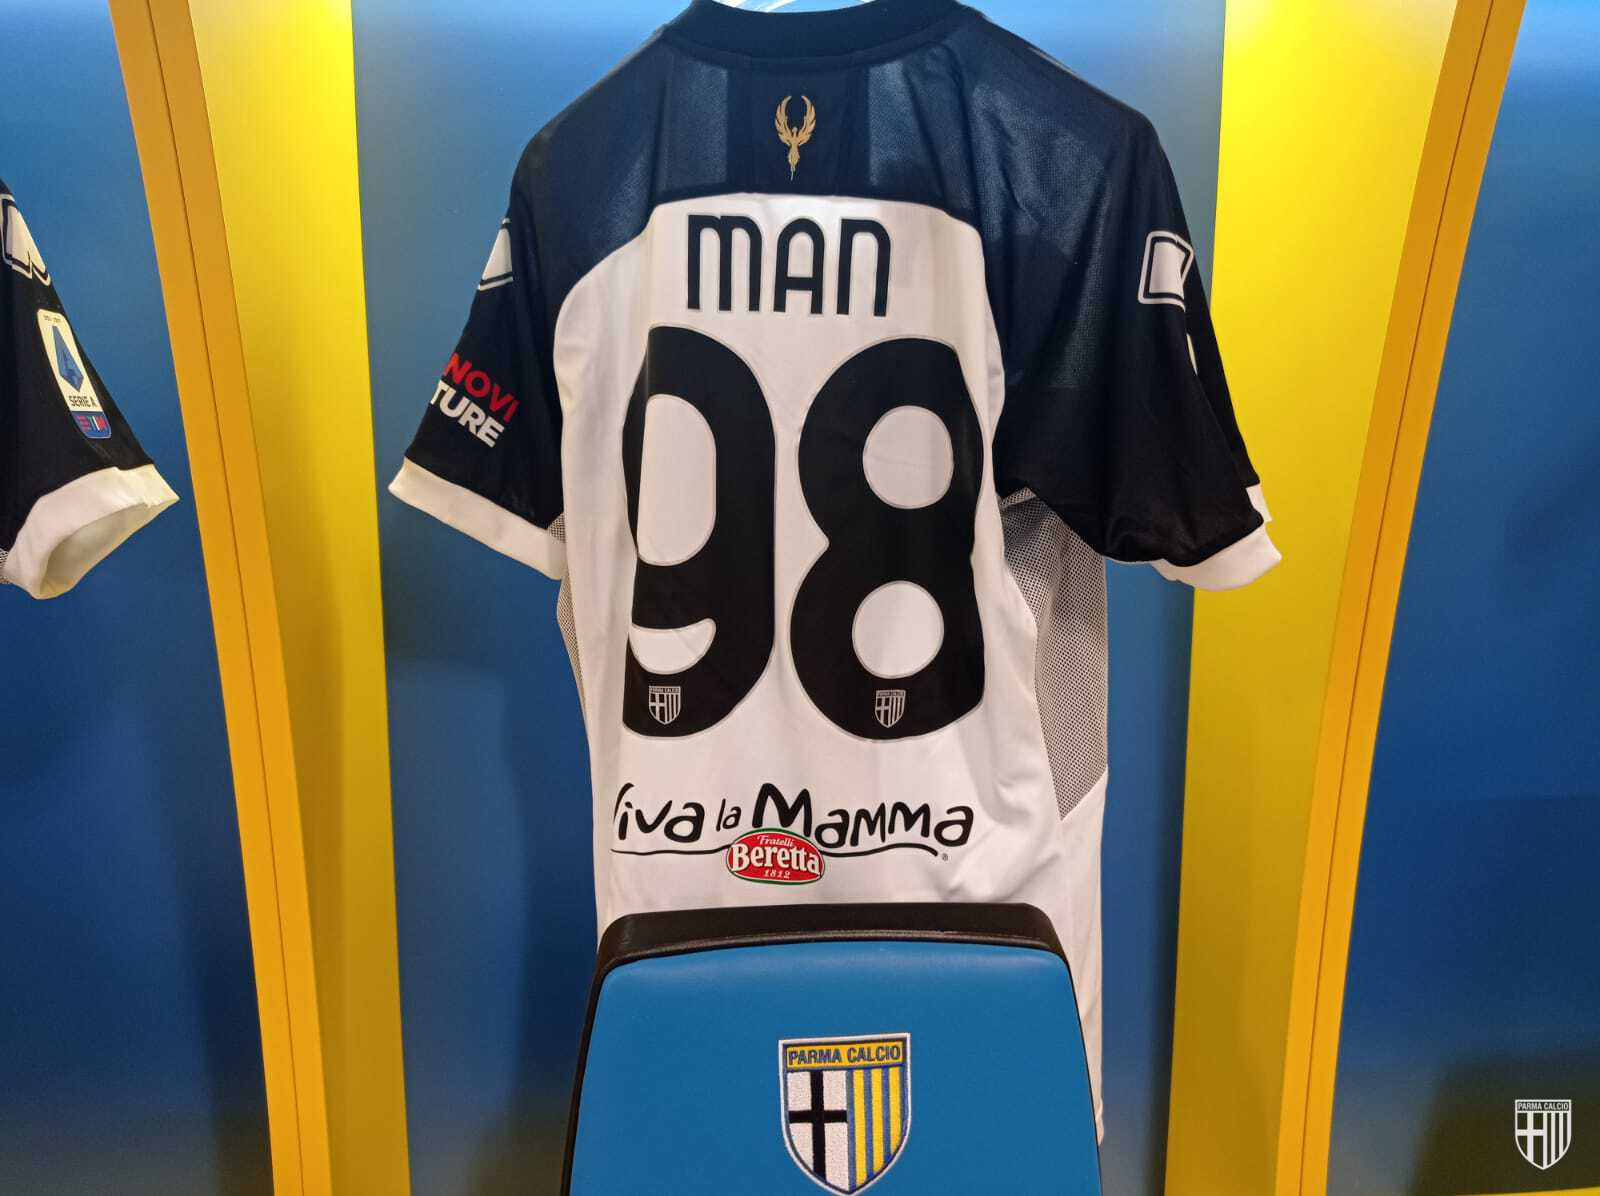 Dennis Man tricoul, sursa foto-Parma/Facebook